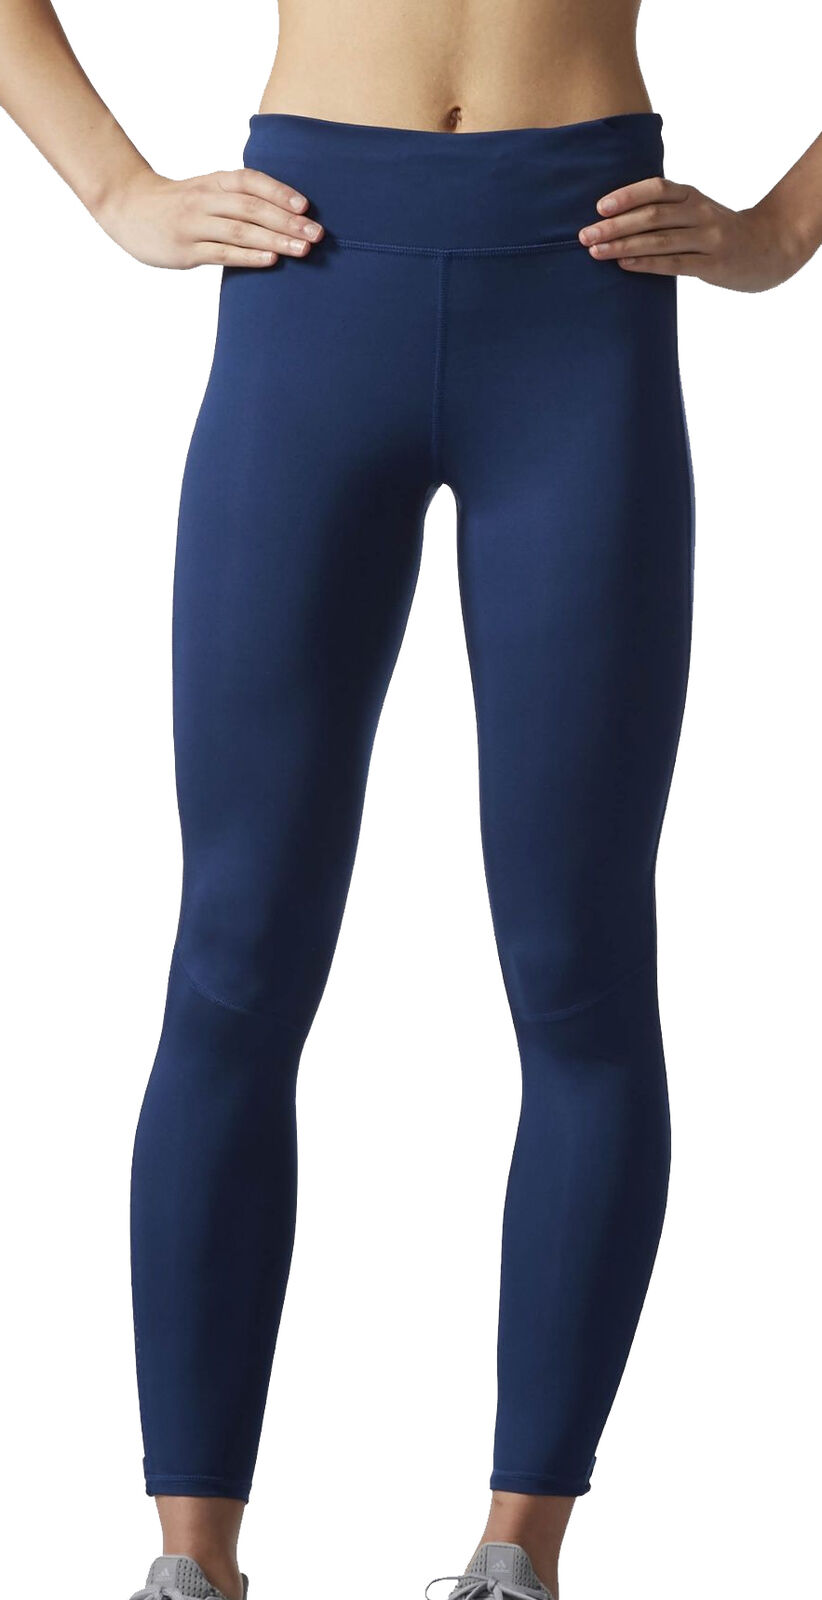 Adidas Supernova Womens Long Running Tights - bluee